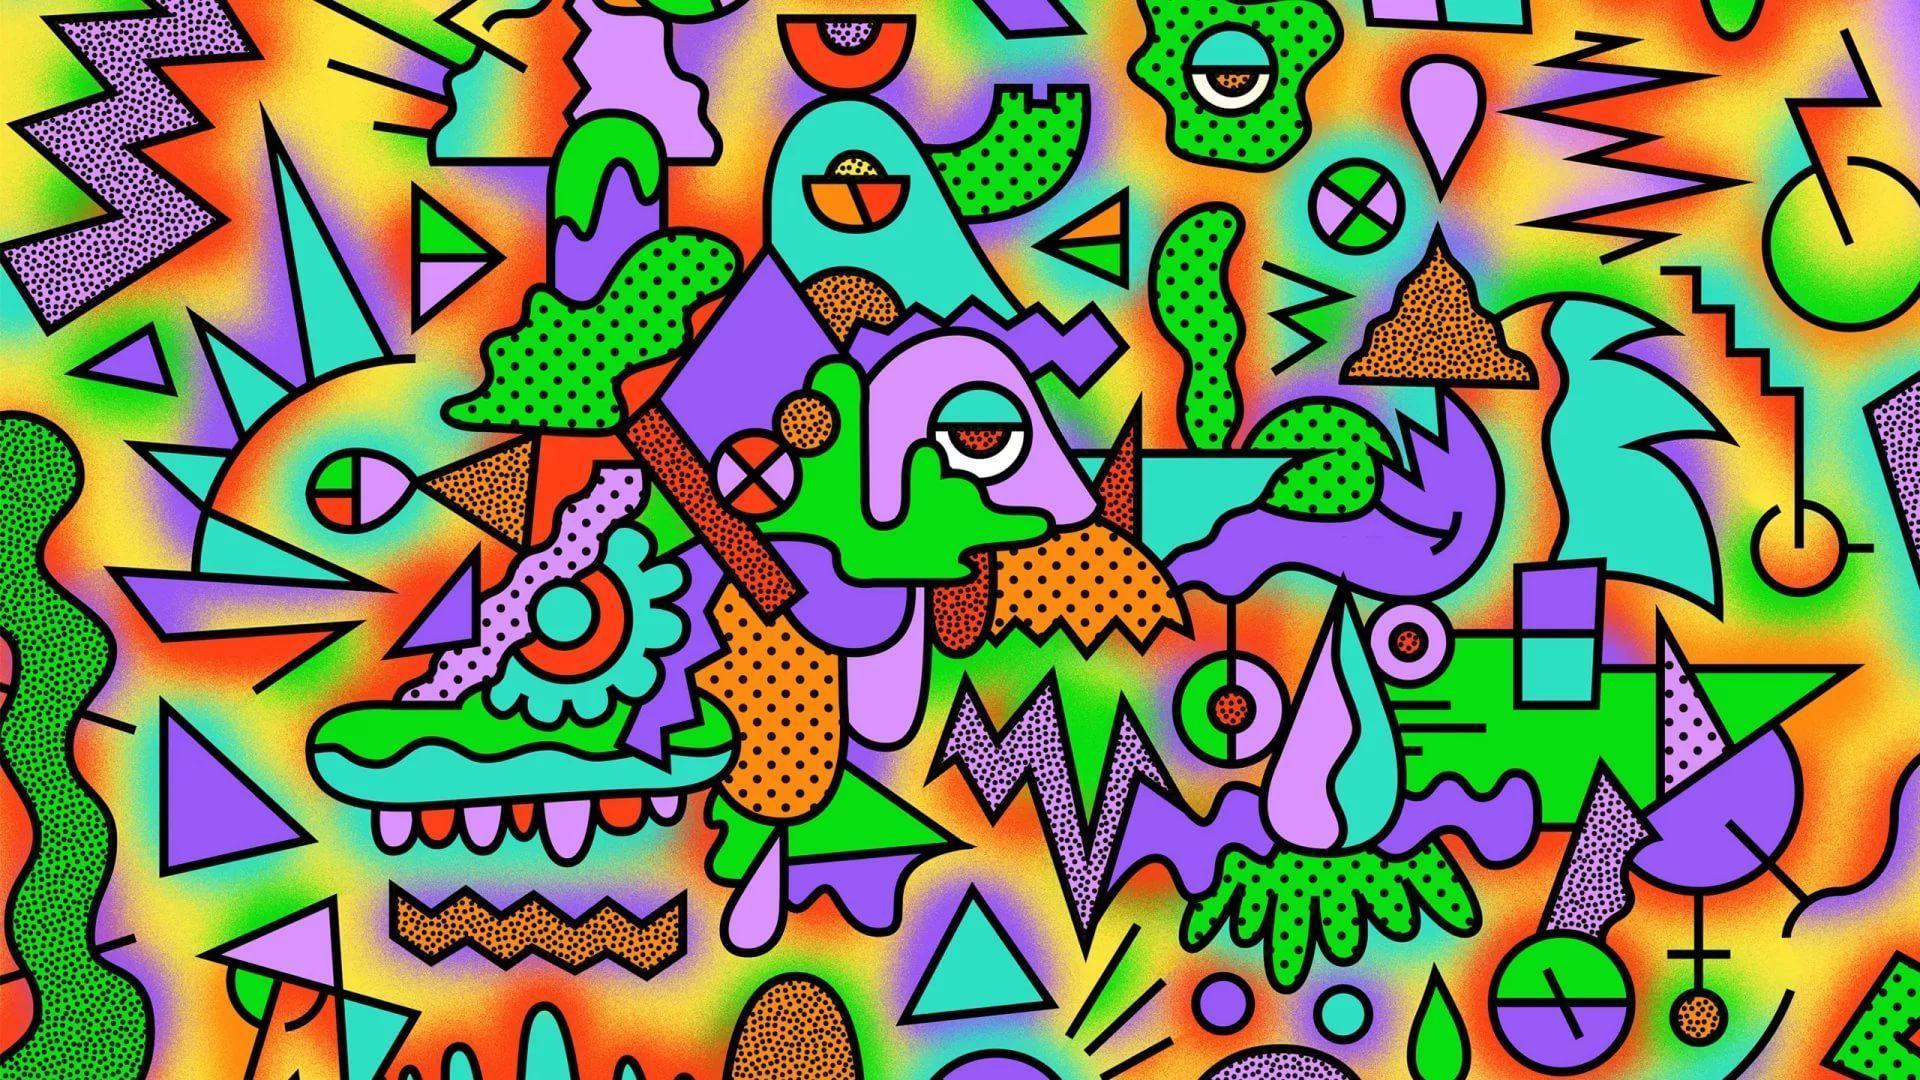 S Cool HD Wallpaper